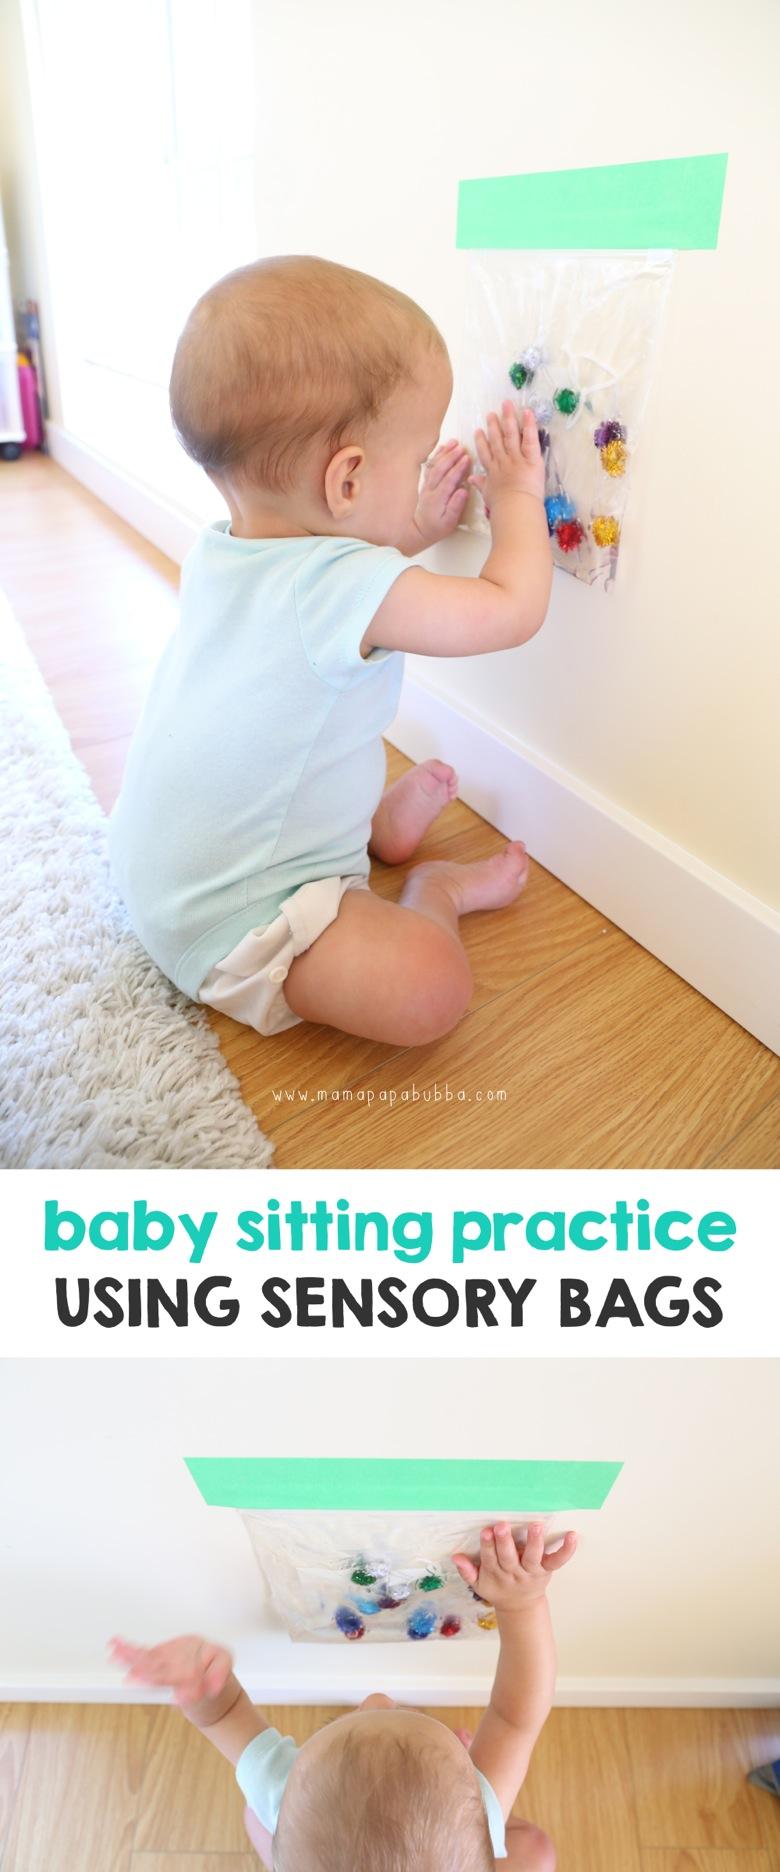 Baby Sitting Practice Using Sensory Bags | Mama Papa Bubba